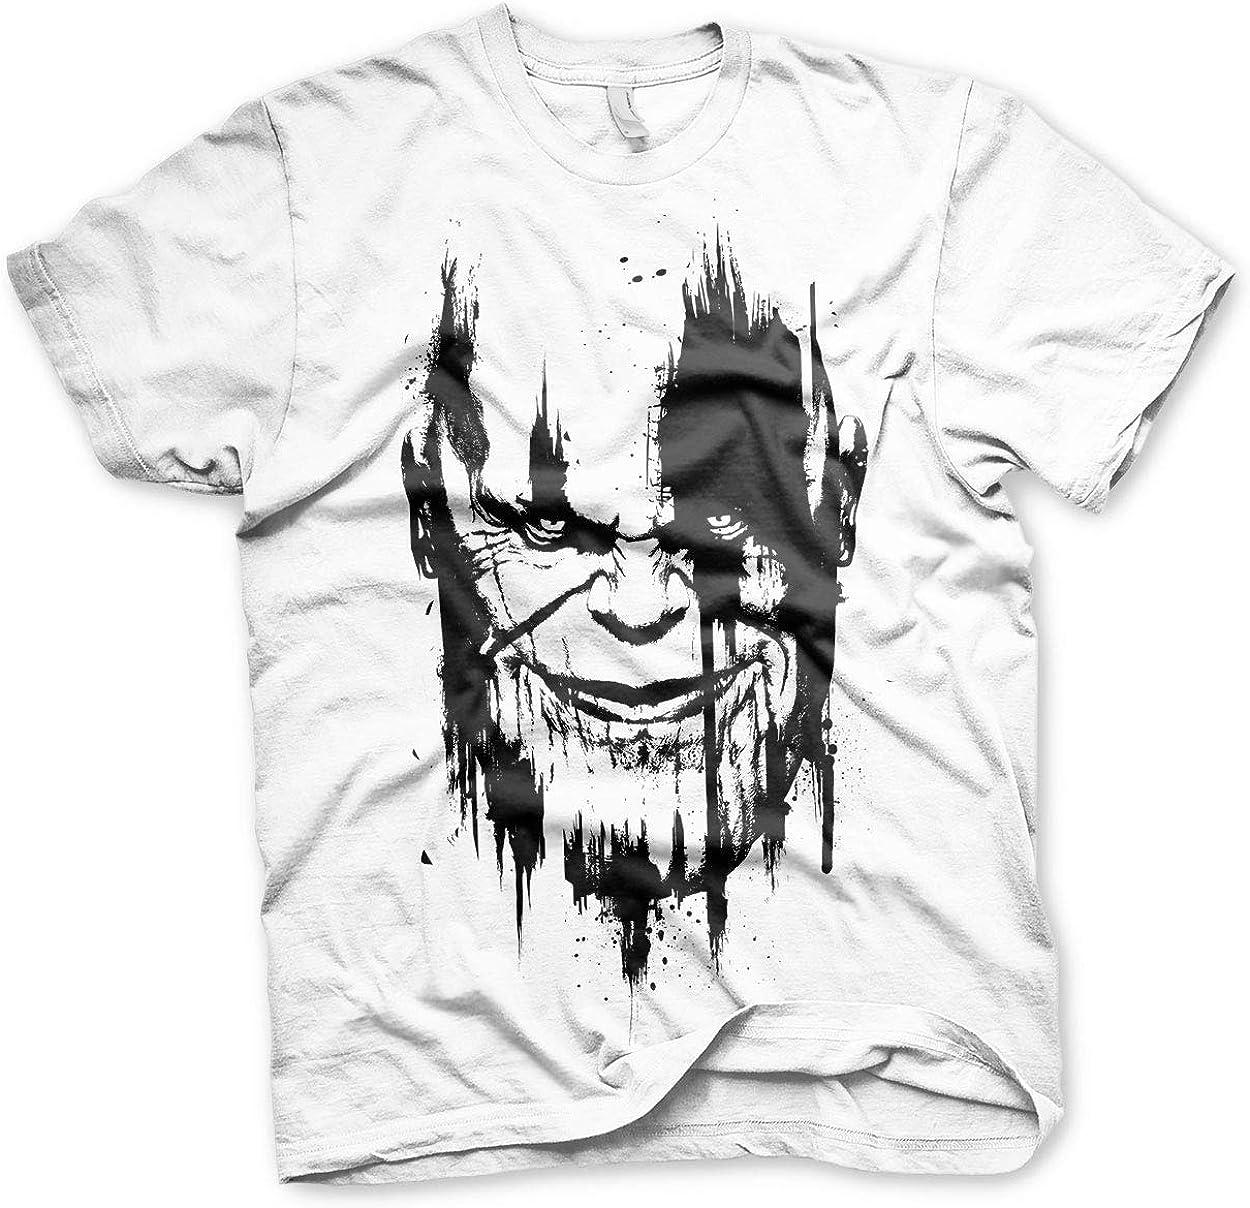 All Sizes Avengers Infinity War Tee Thanos Infinity Gauntlet T-Shirt